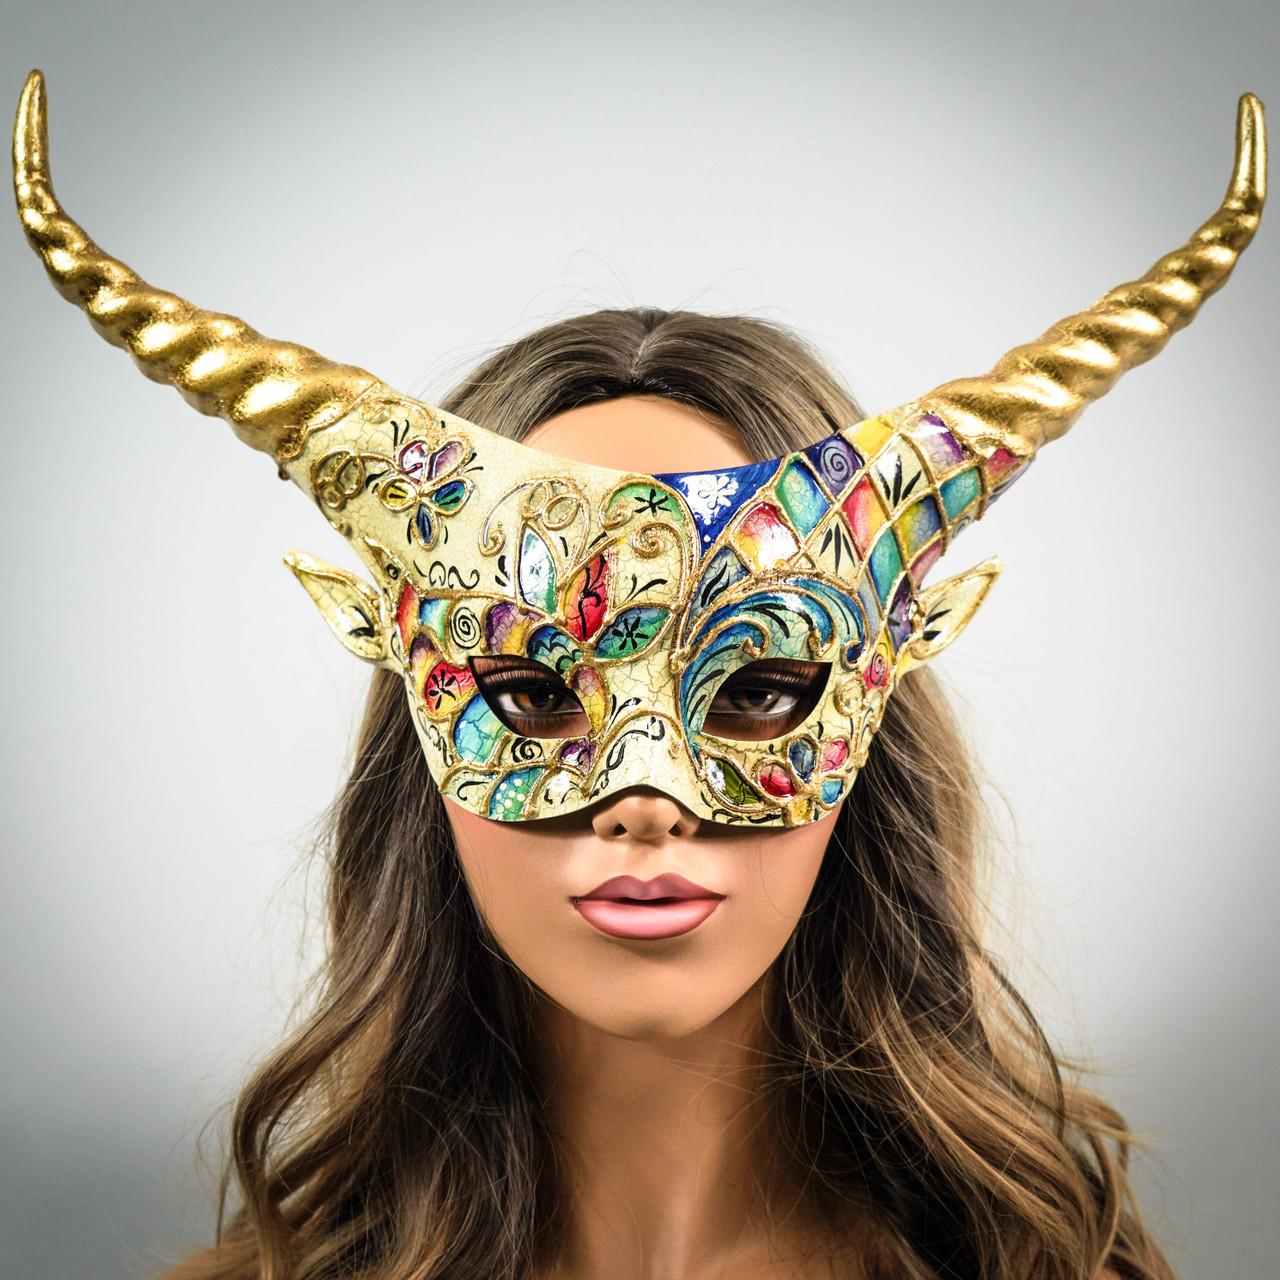 Expensive Masks For Halloween.New Ram Masquerade Masks Burning Man Face Mask Usa Free Shipping